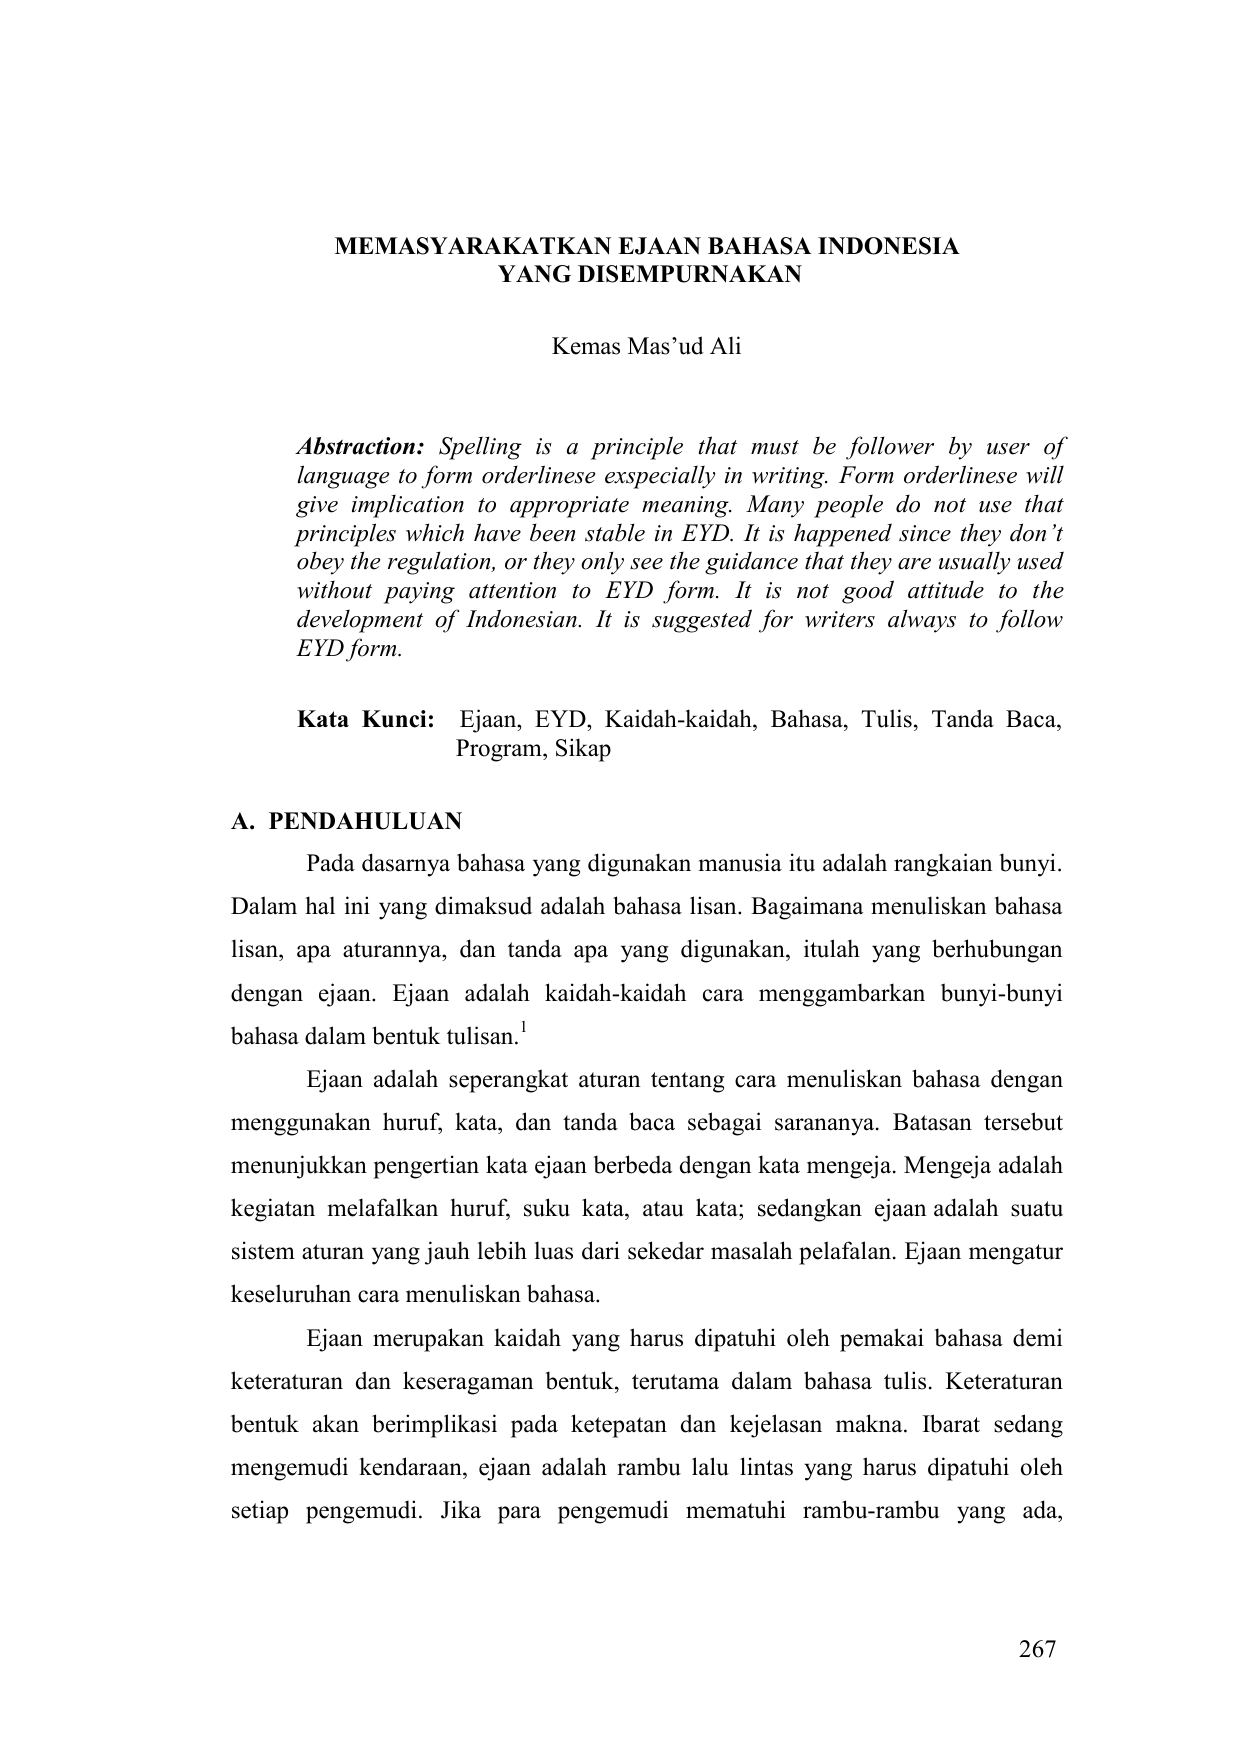 Memasyarakatkan Ejaan Bahasa Indonesia Yang Disempurnakan